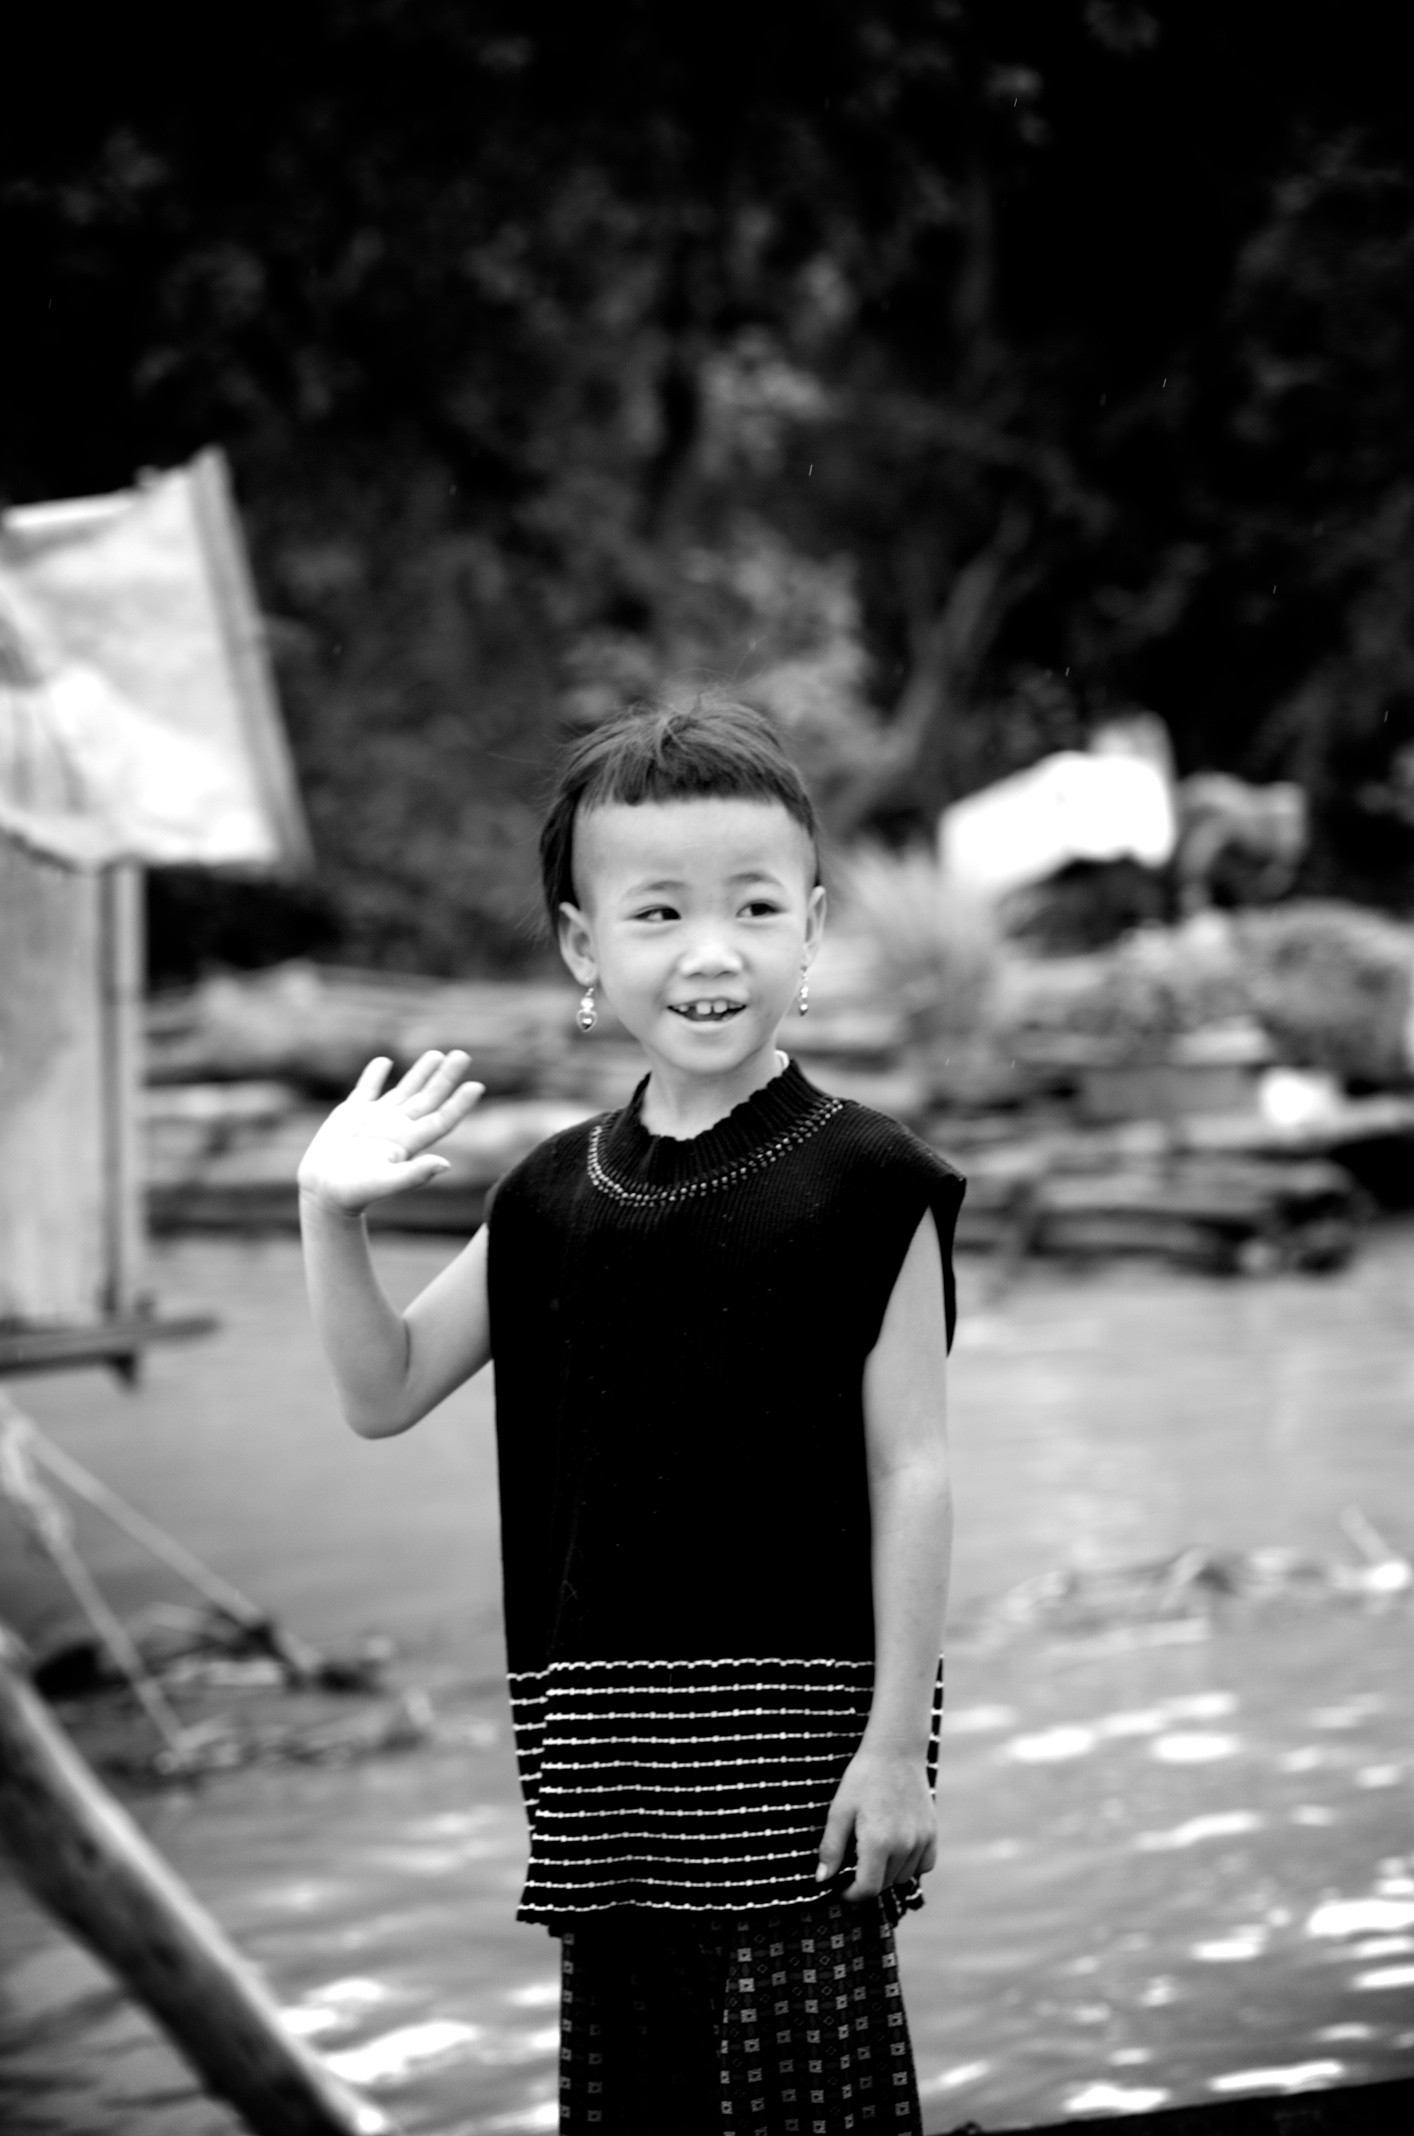 AlexSoh_July09 Cambodia066